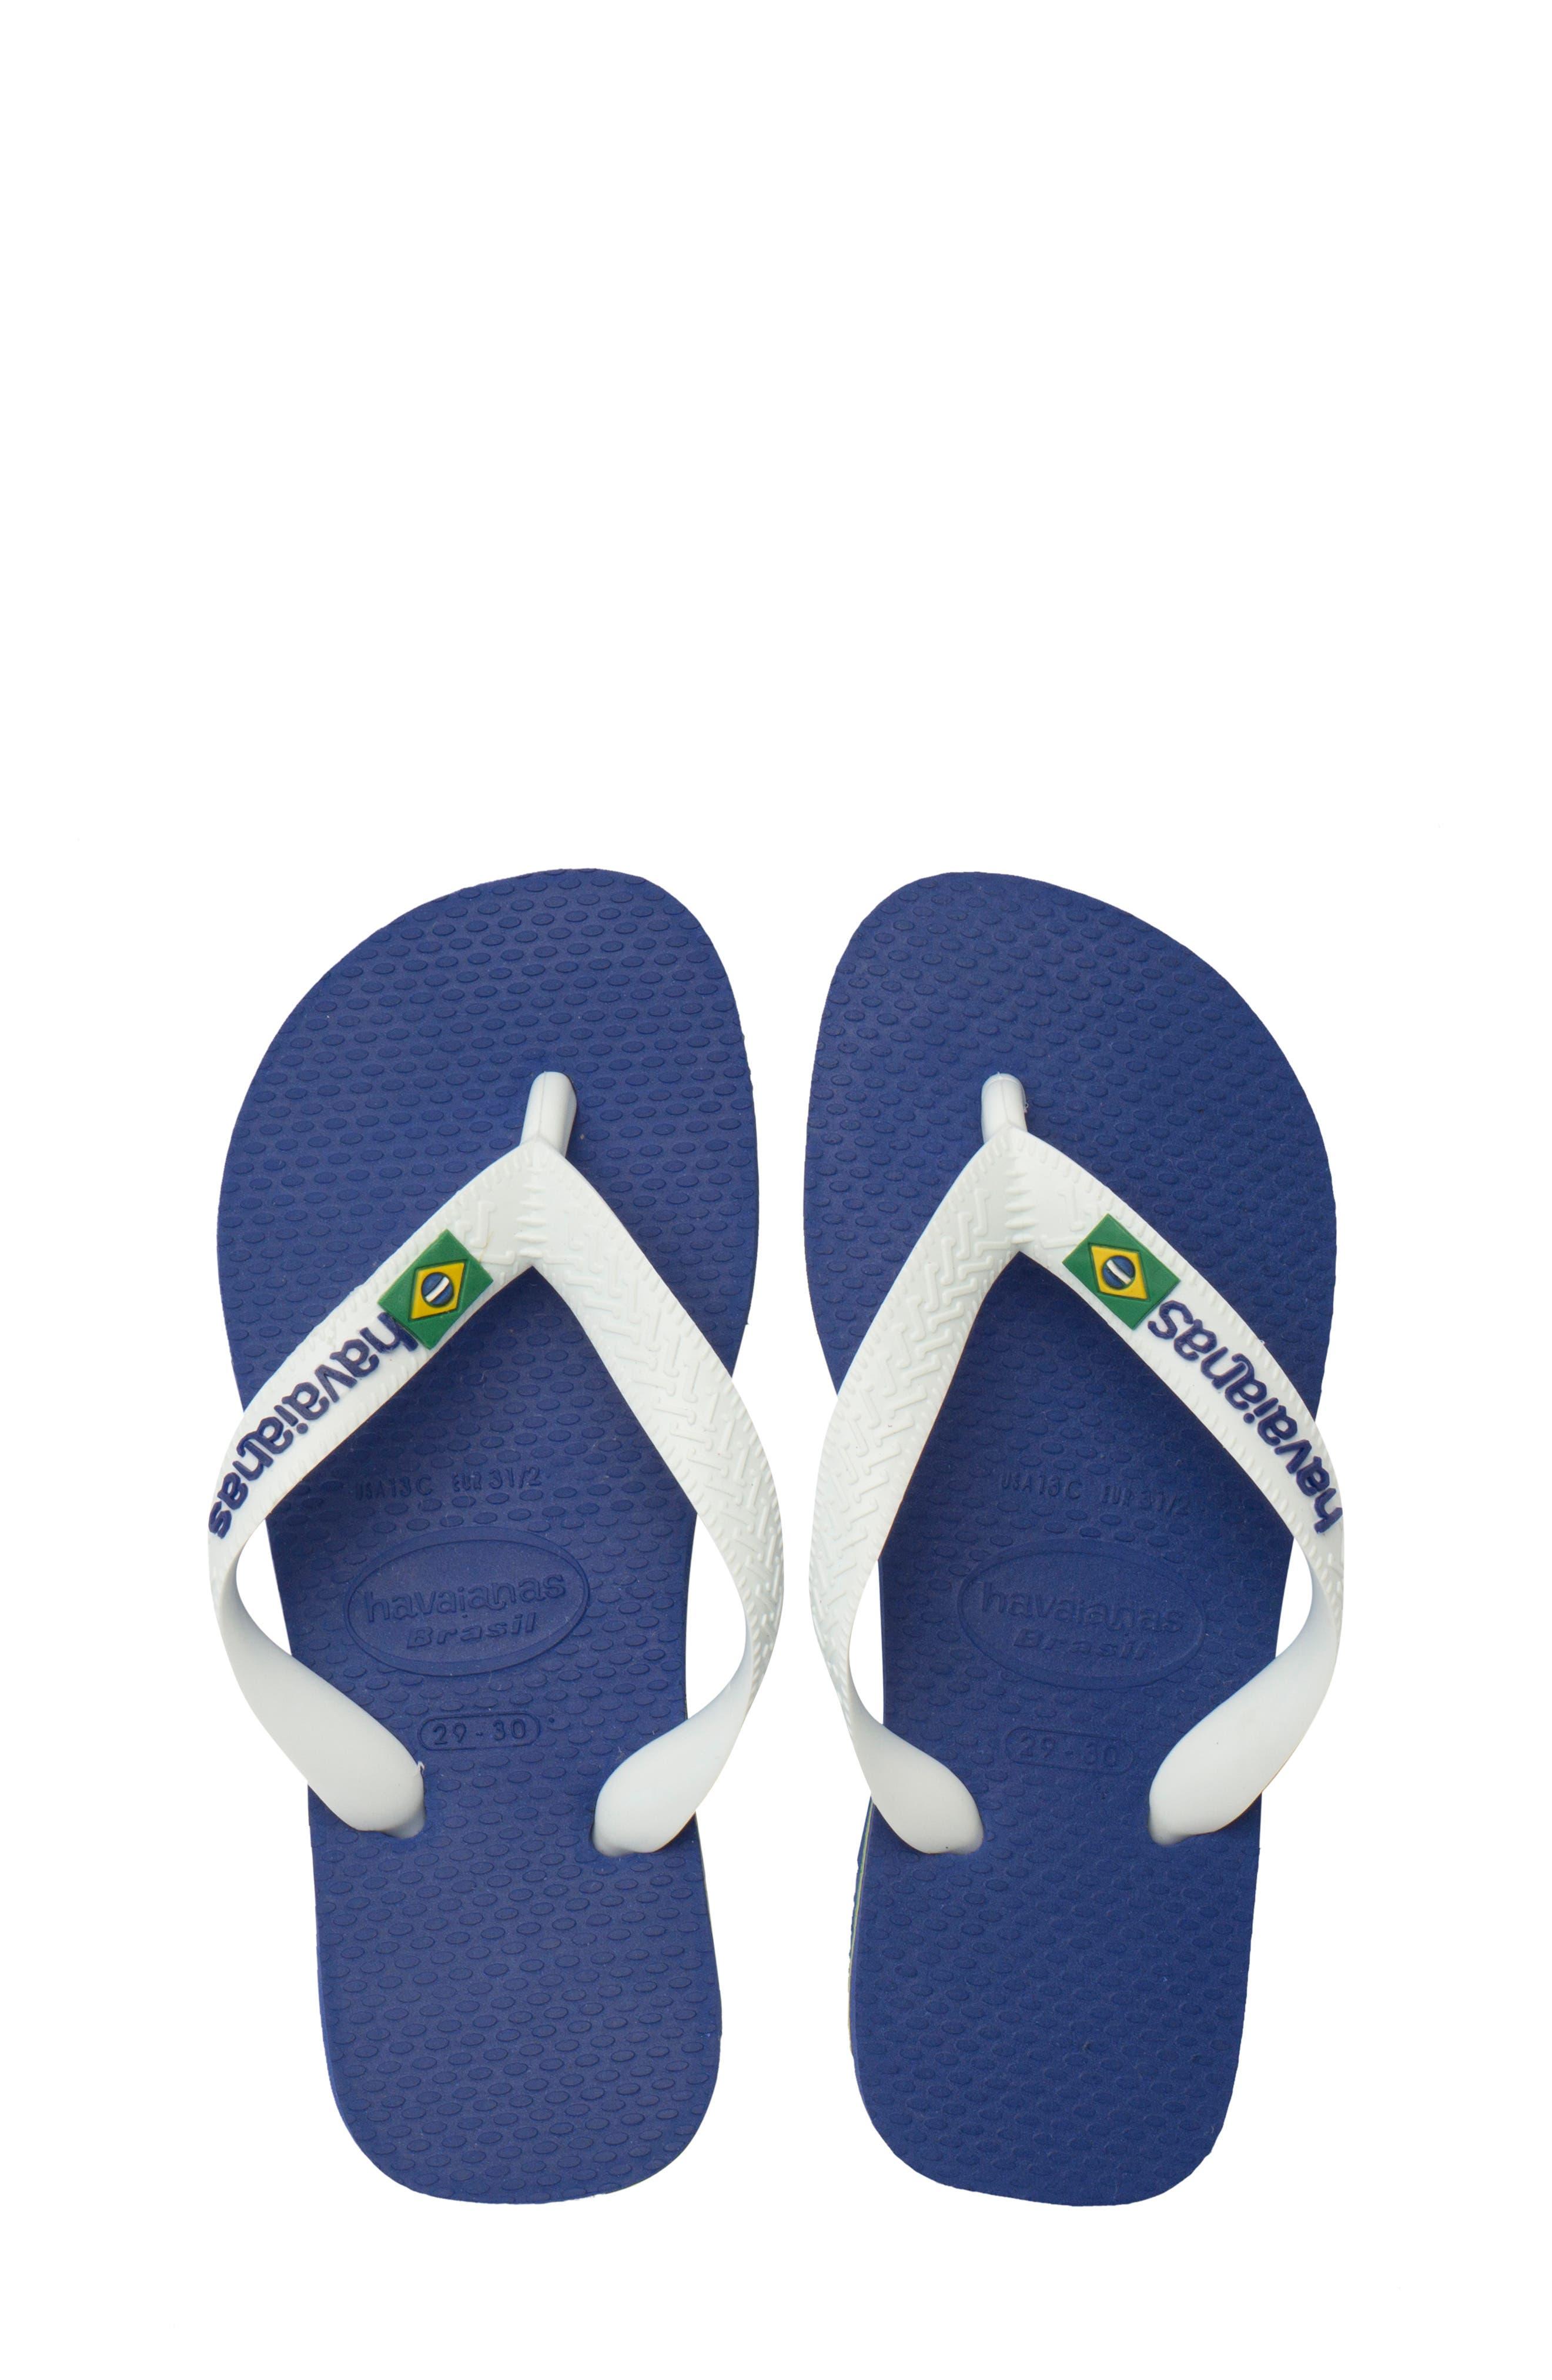 a6a9b7221 Girls  Flip-Flop Shoes